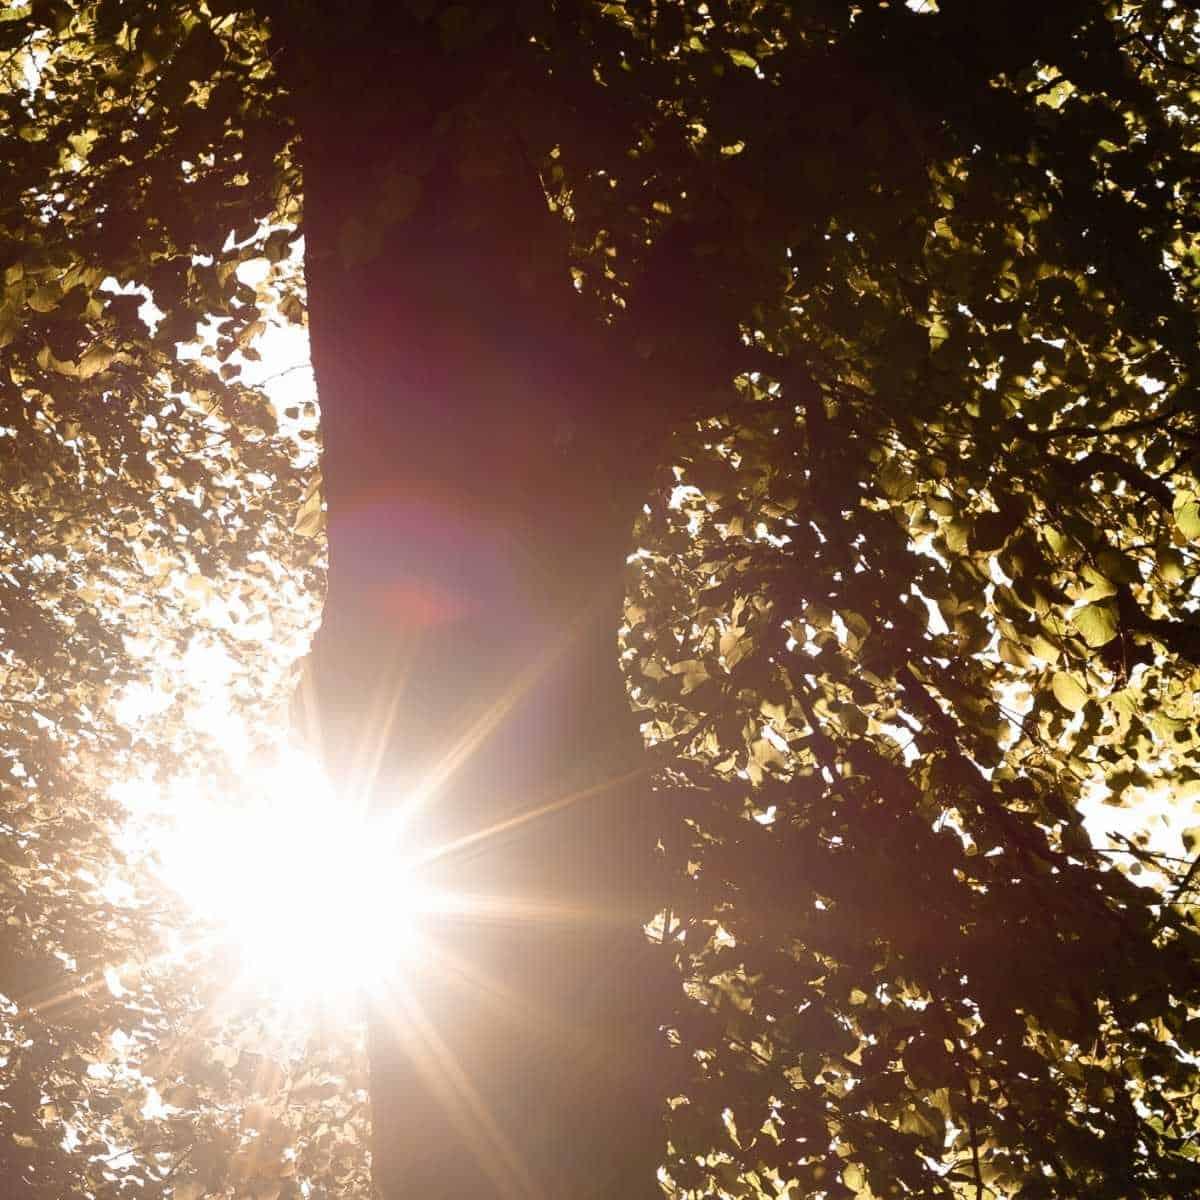 big tree with sun shining through